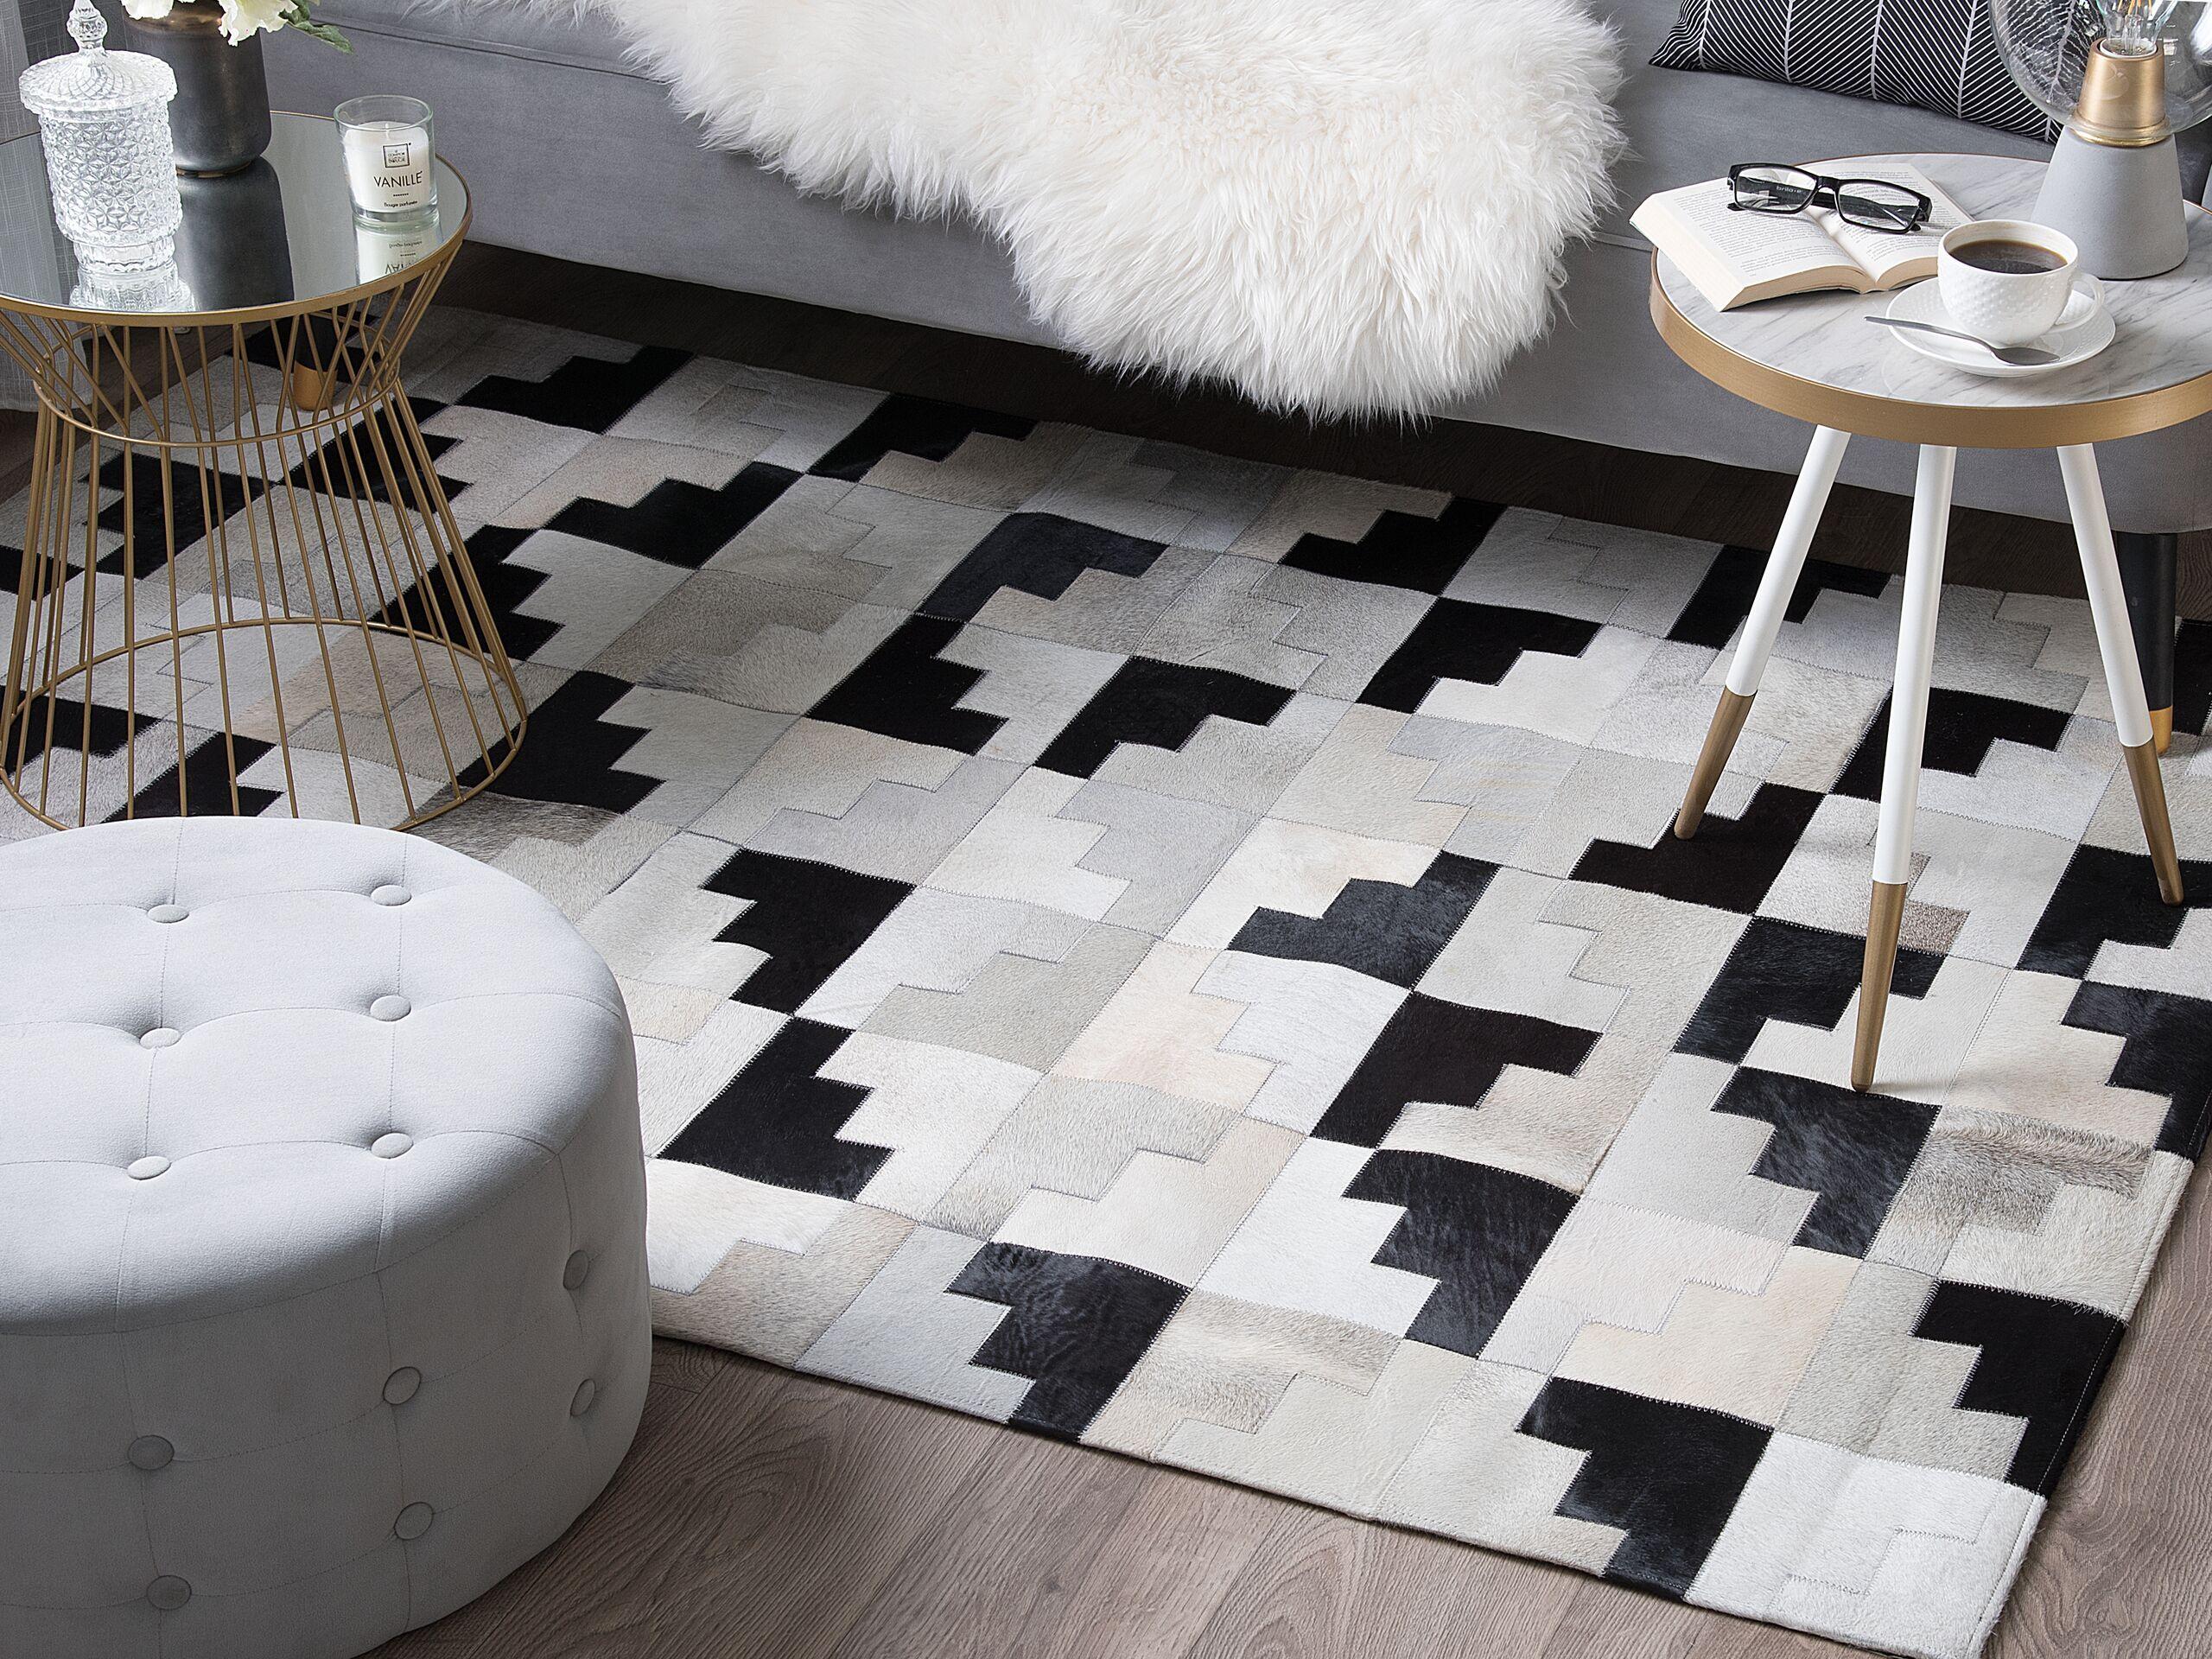 beliani tappeto in pelle nero / grigio 140 x 200 cm